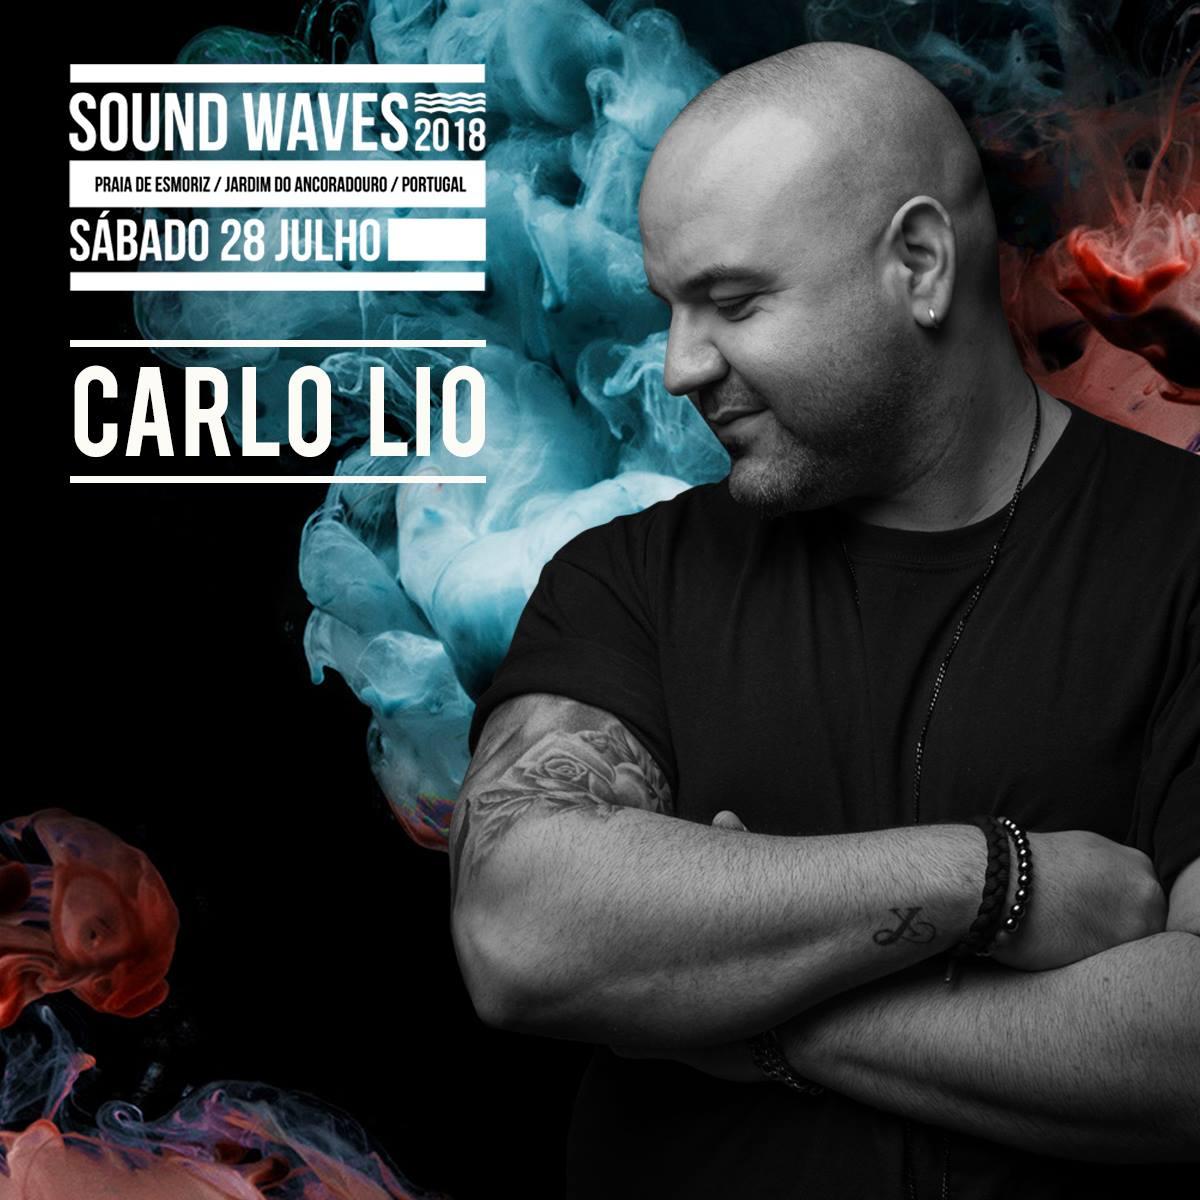 Carlo Lio SW 2018